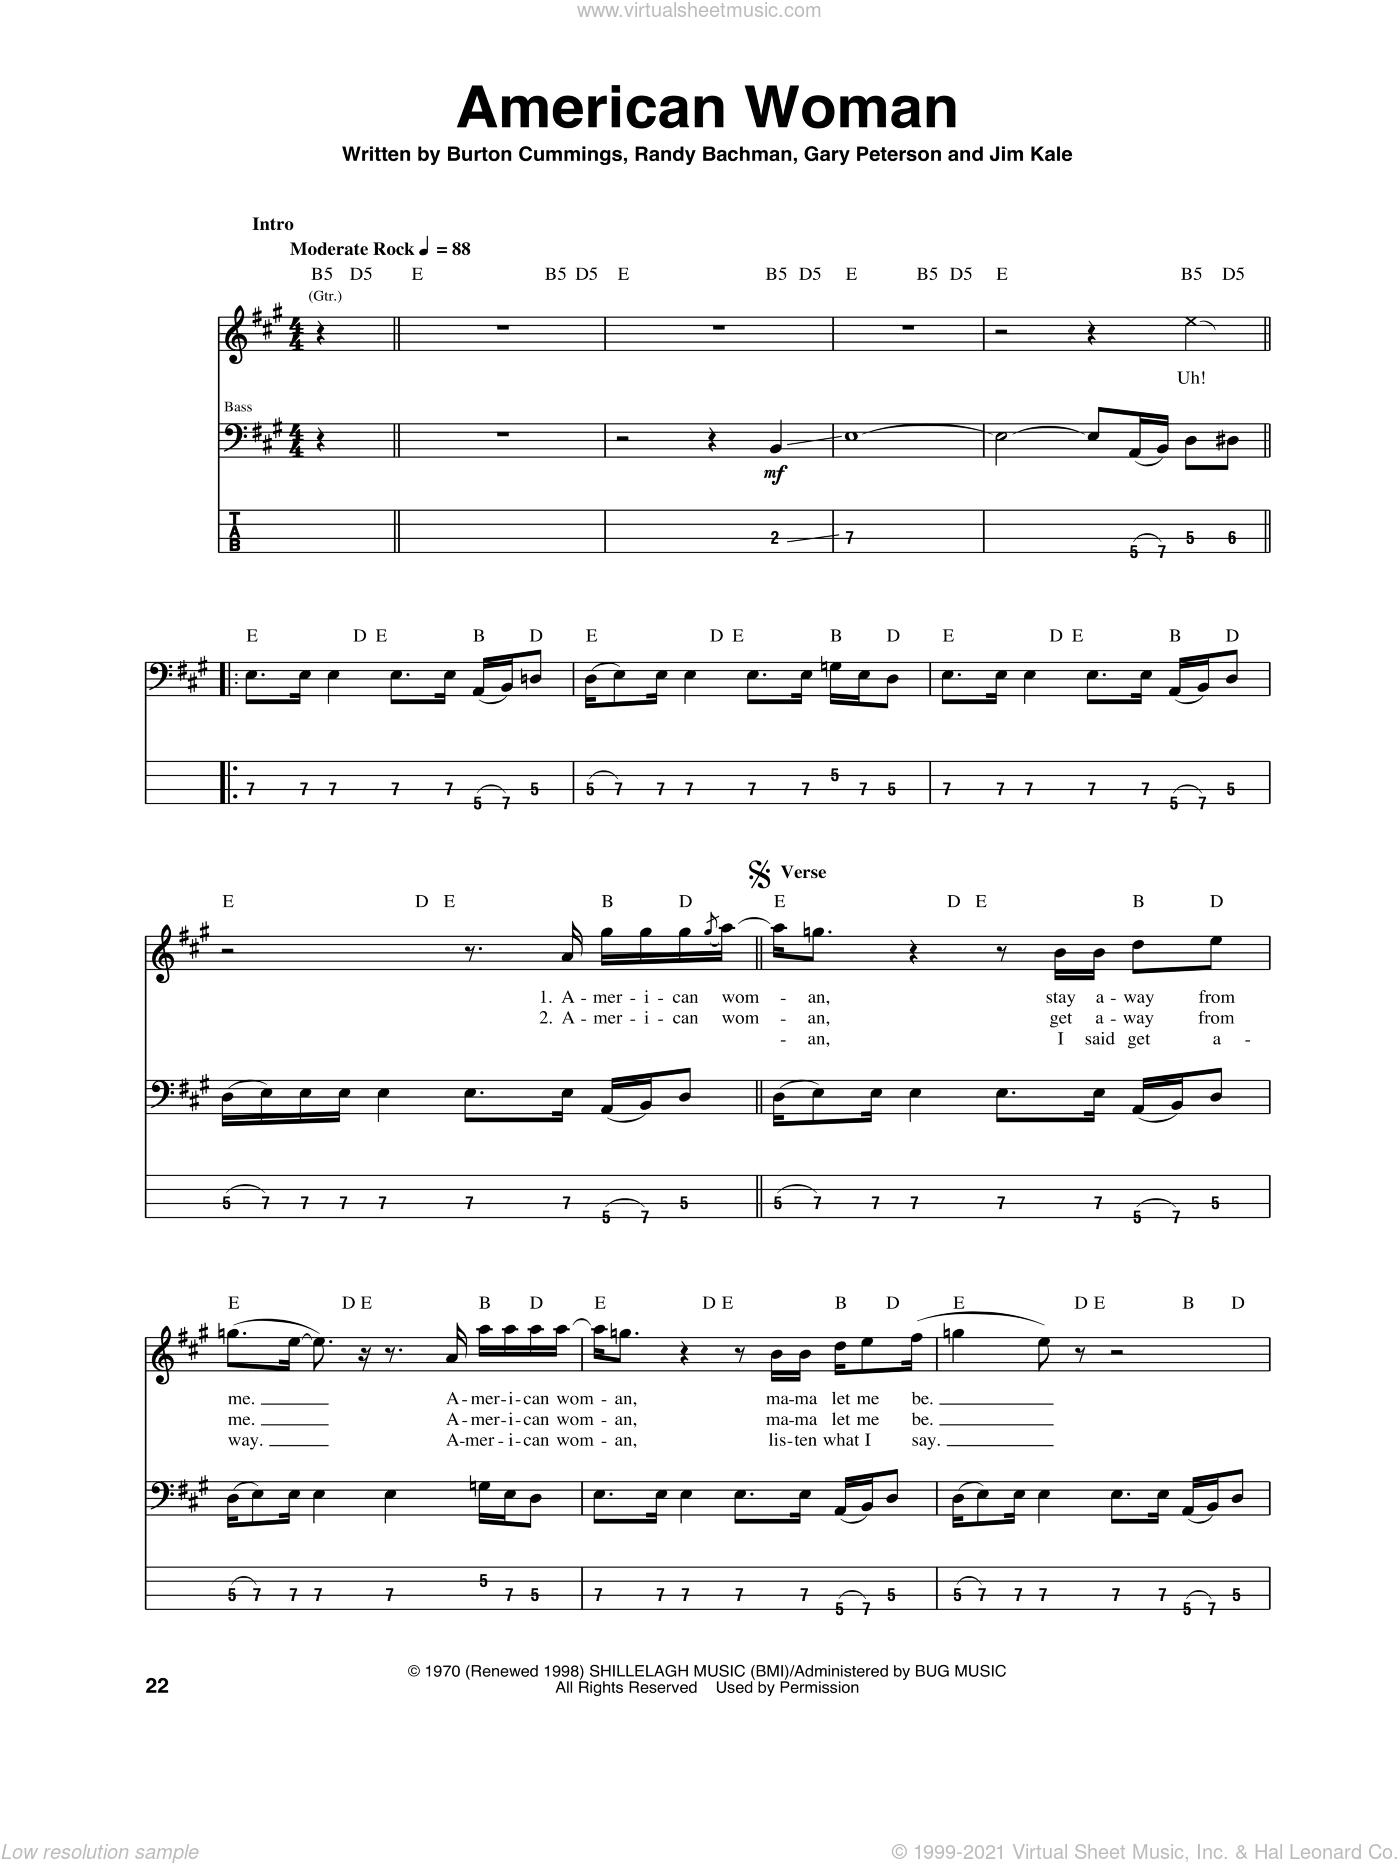 American Woman sheet music for bass (tablature) (bass guitar) by The Guess Who, Burton Cummings, Garry Peterson, Jim Kale and Randy Bachman, intermediate skill level